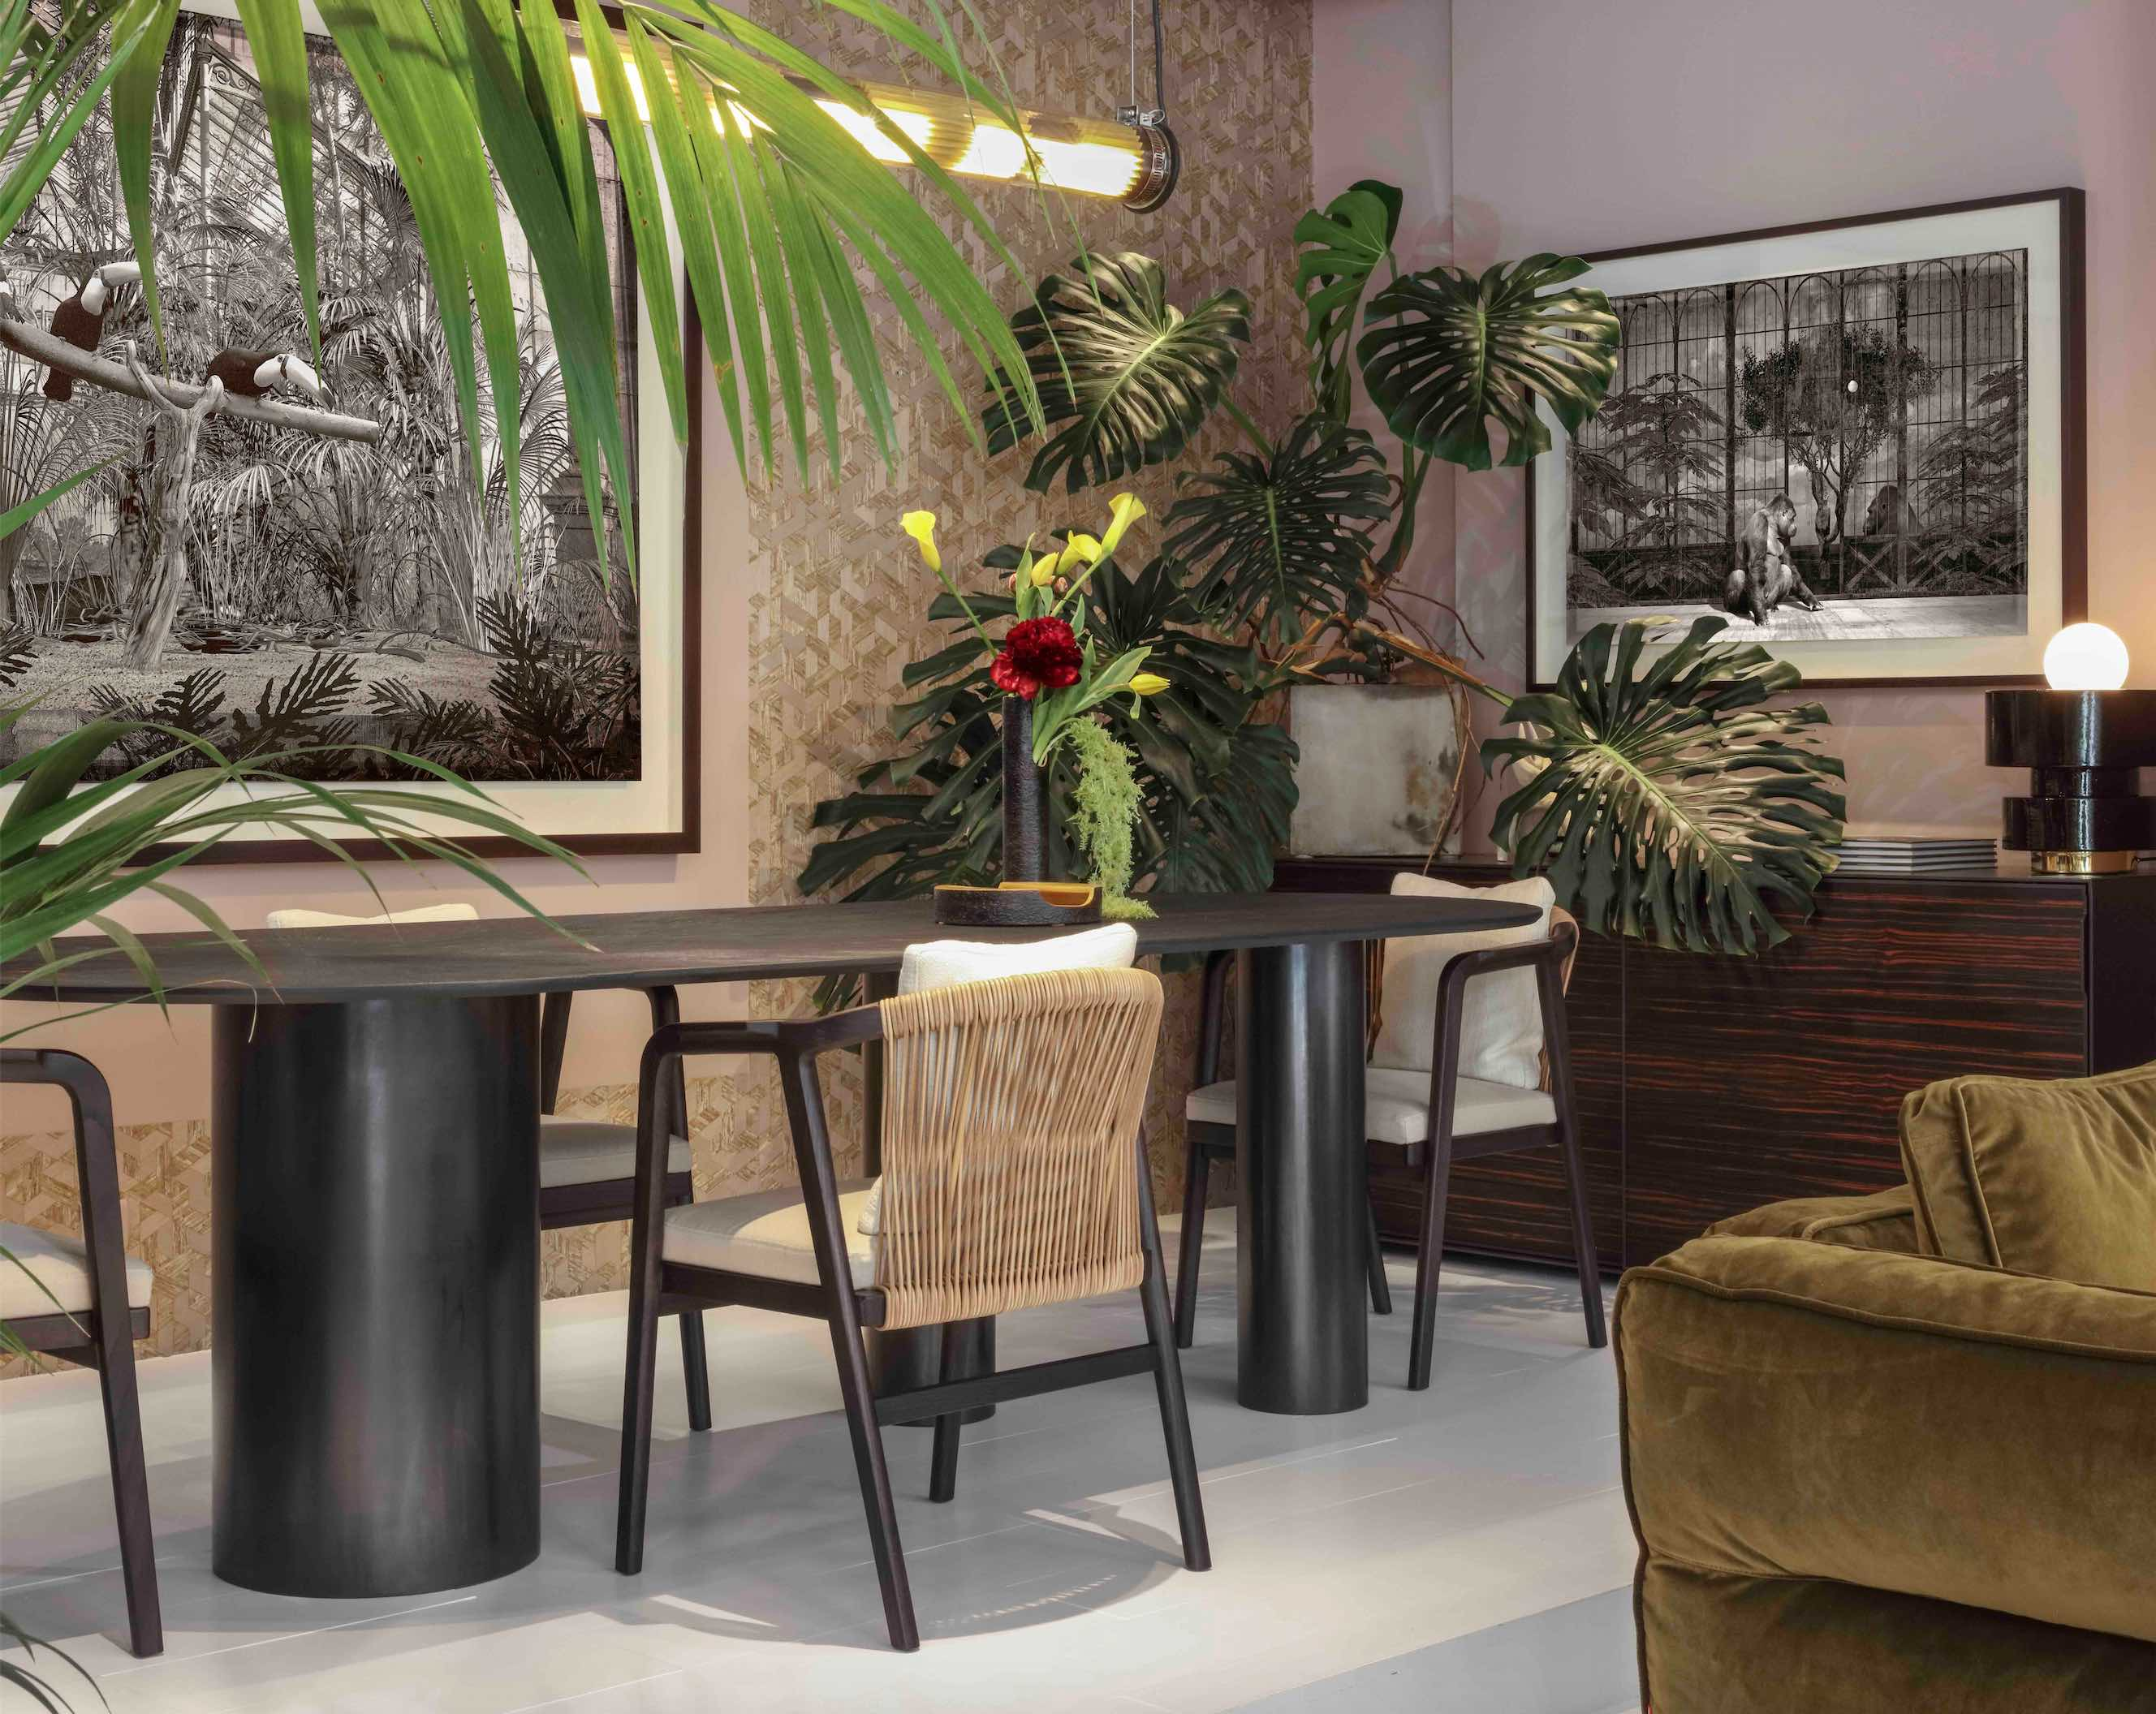 Jan Gulfoss chez Claude Cartier Décoration Inside Gallery Photography Galerie Daltra